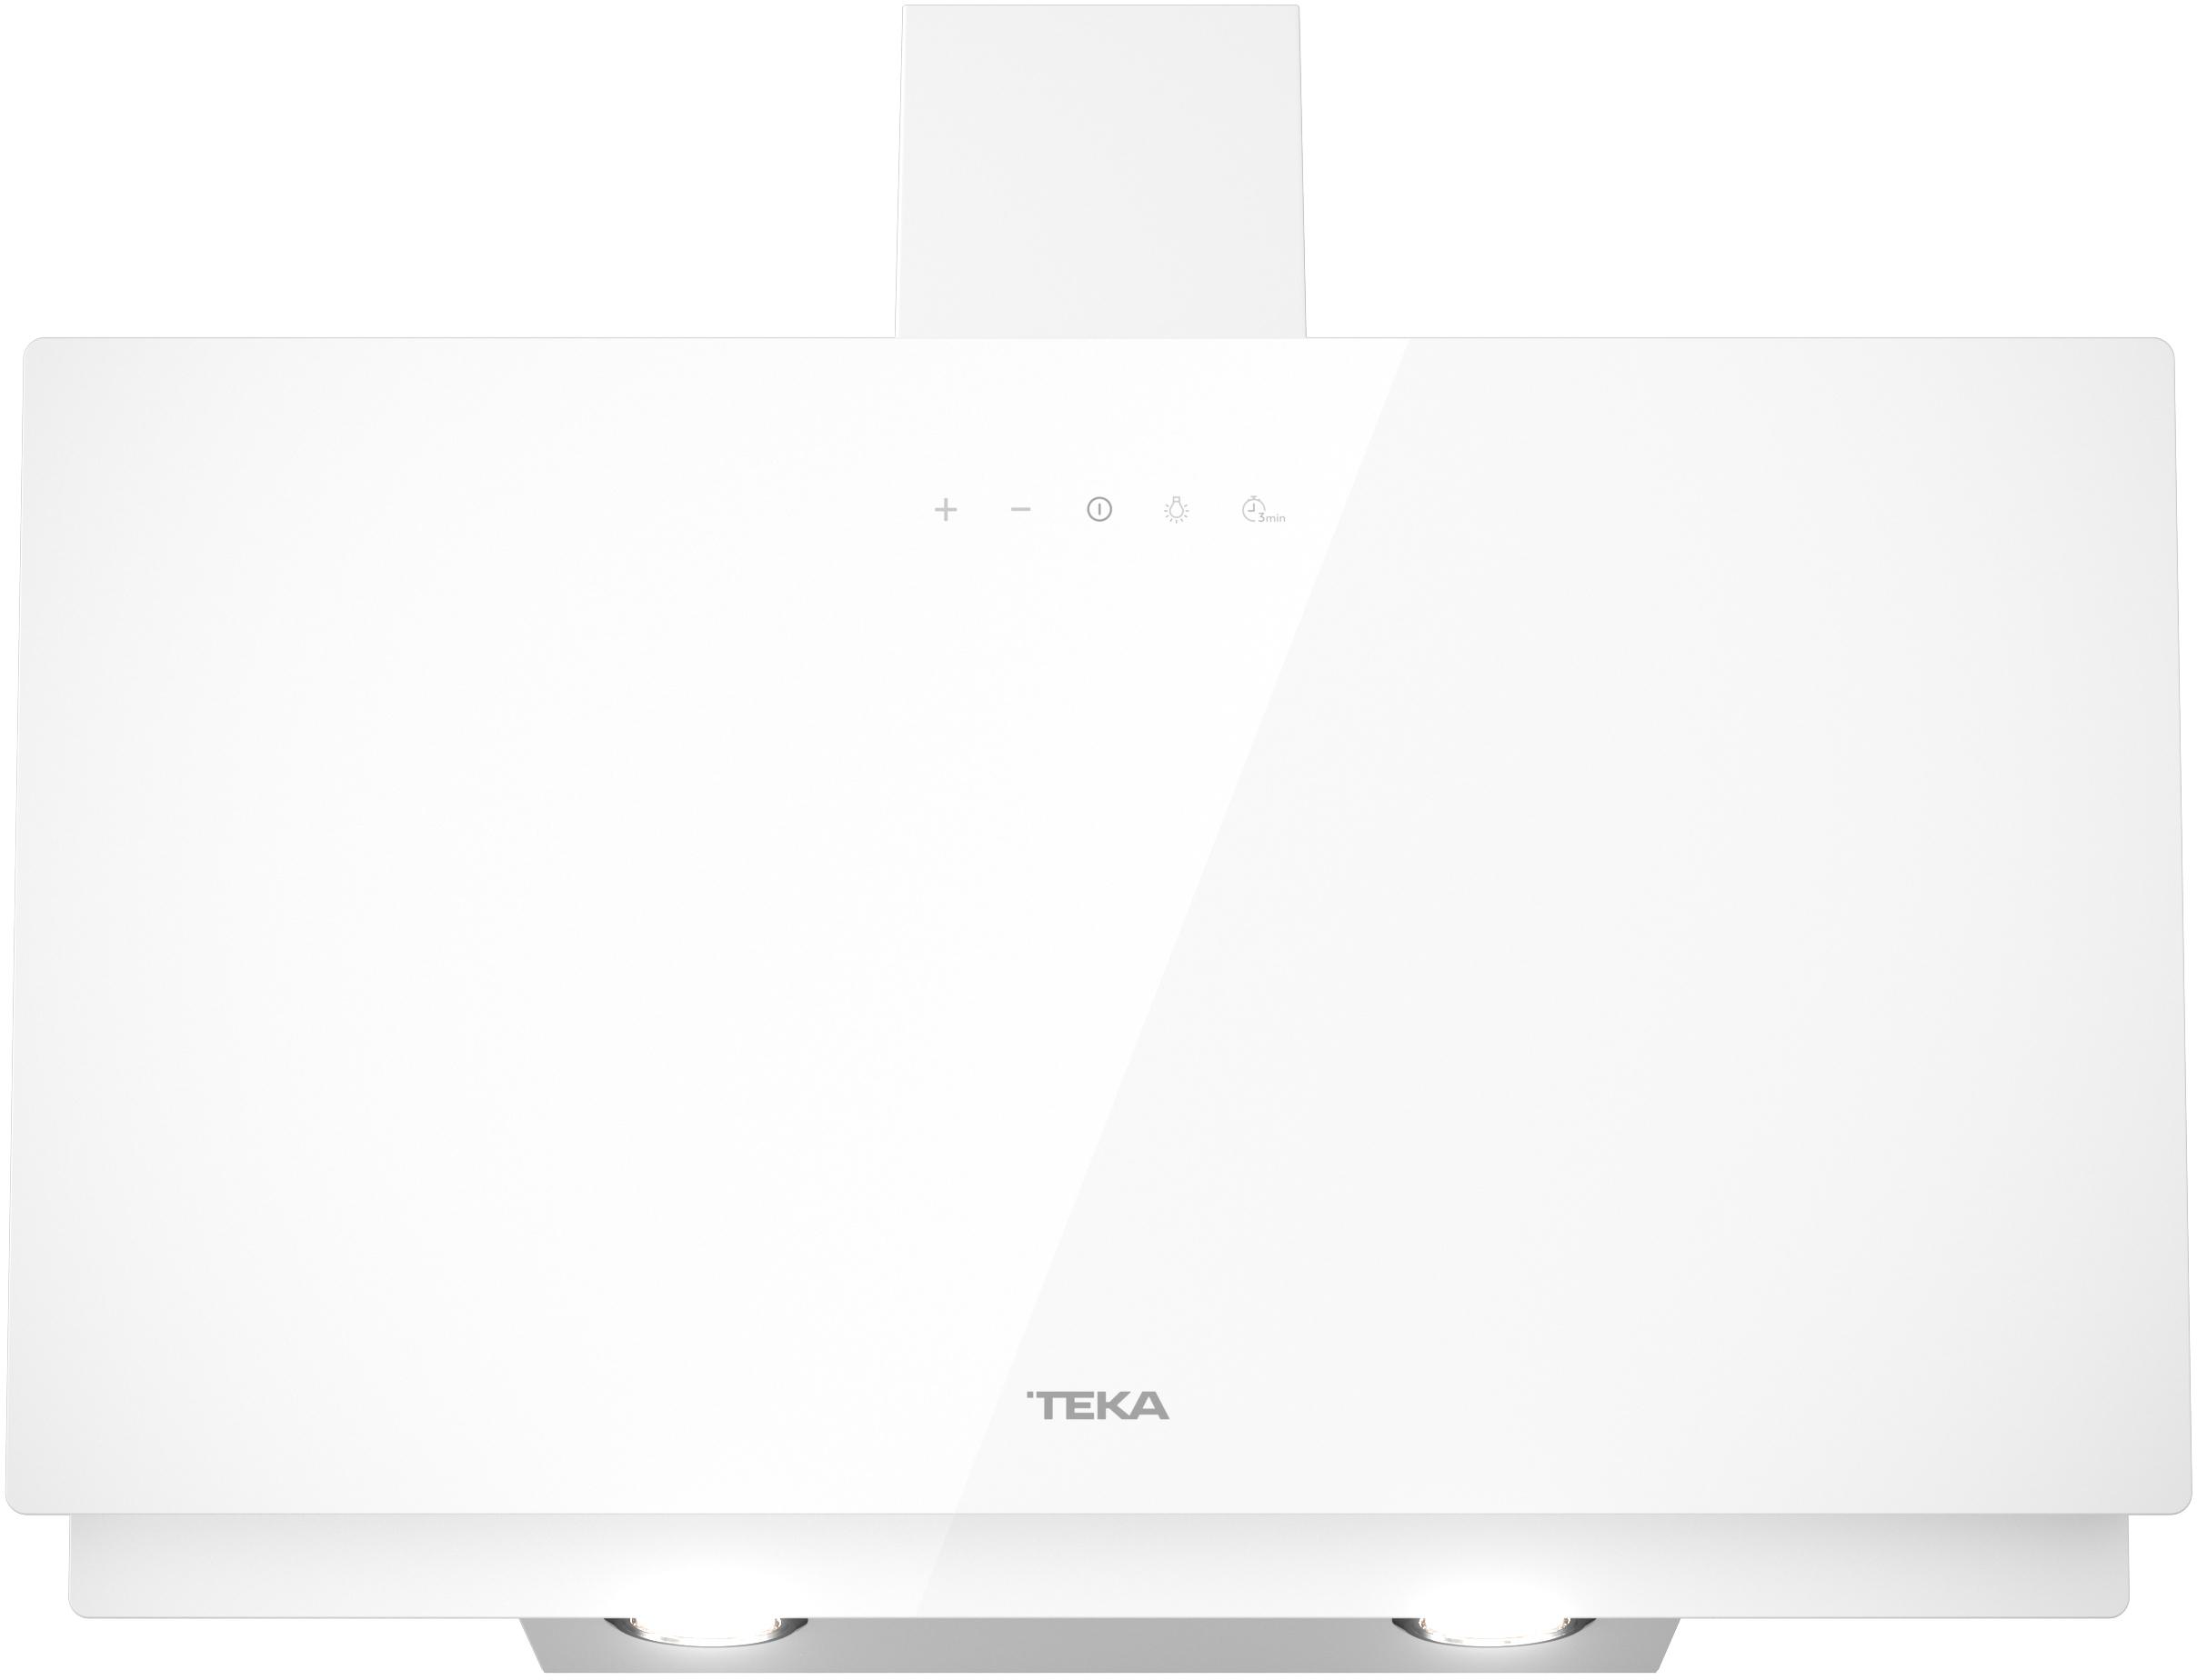 Campana Teka DVN7403 Pared 70cm Cris Wh 112950007